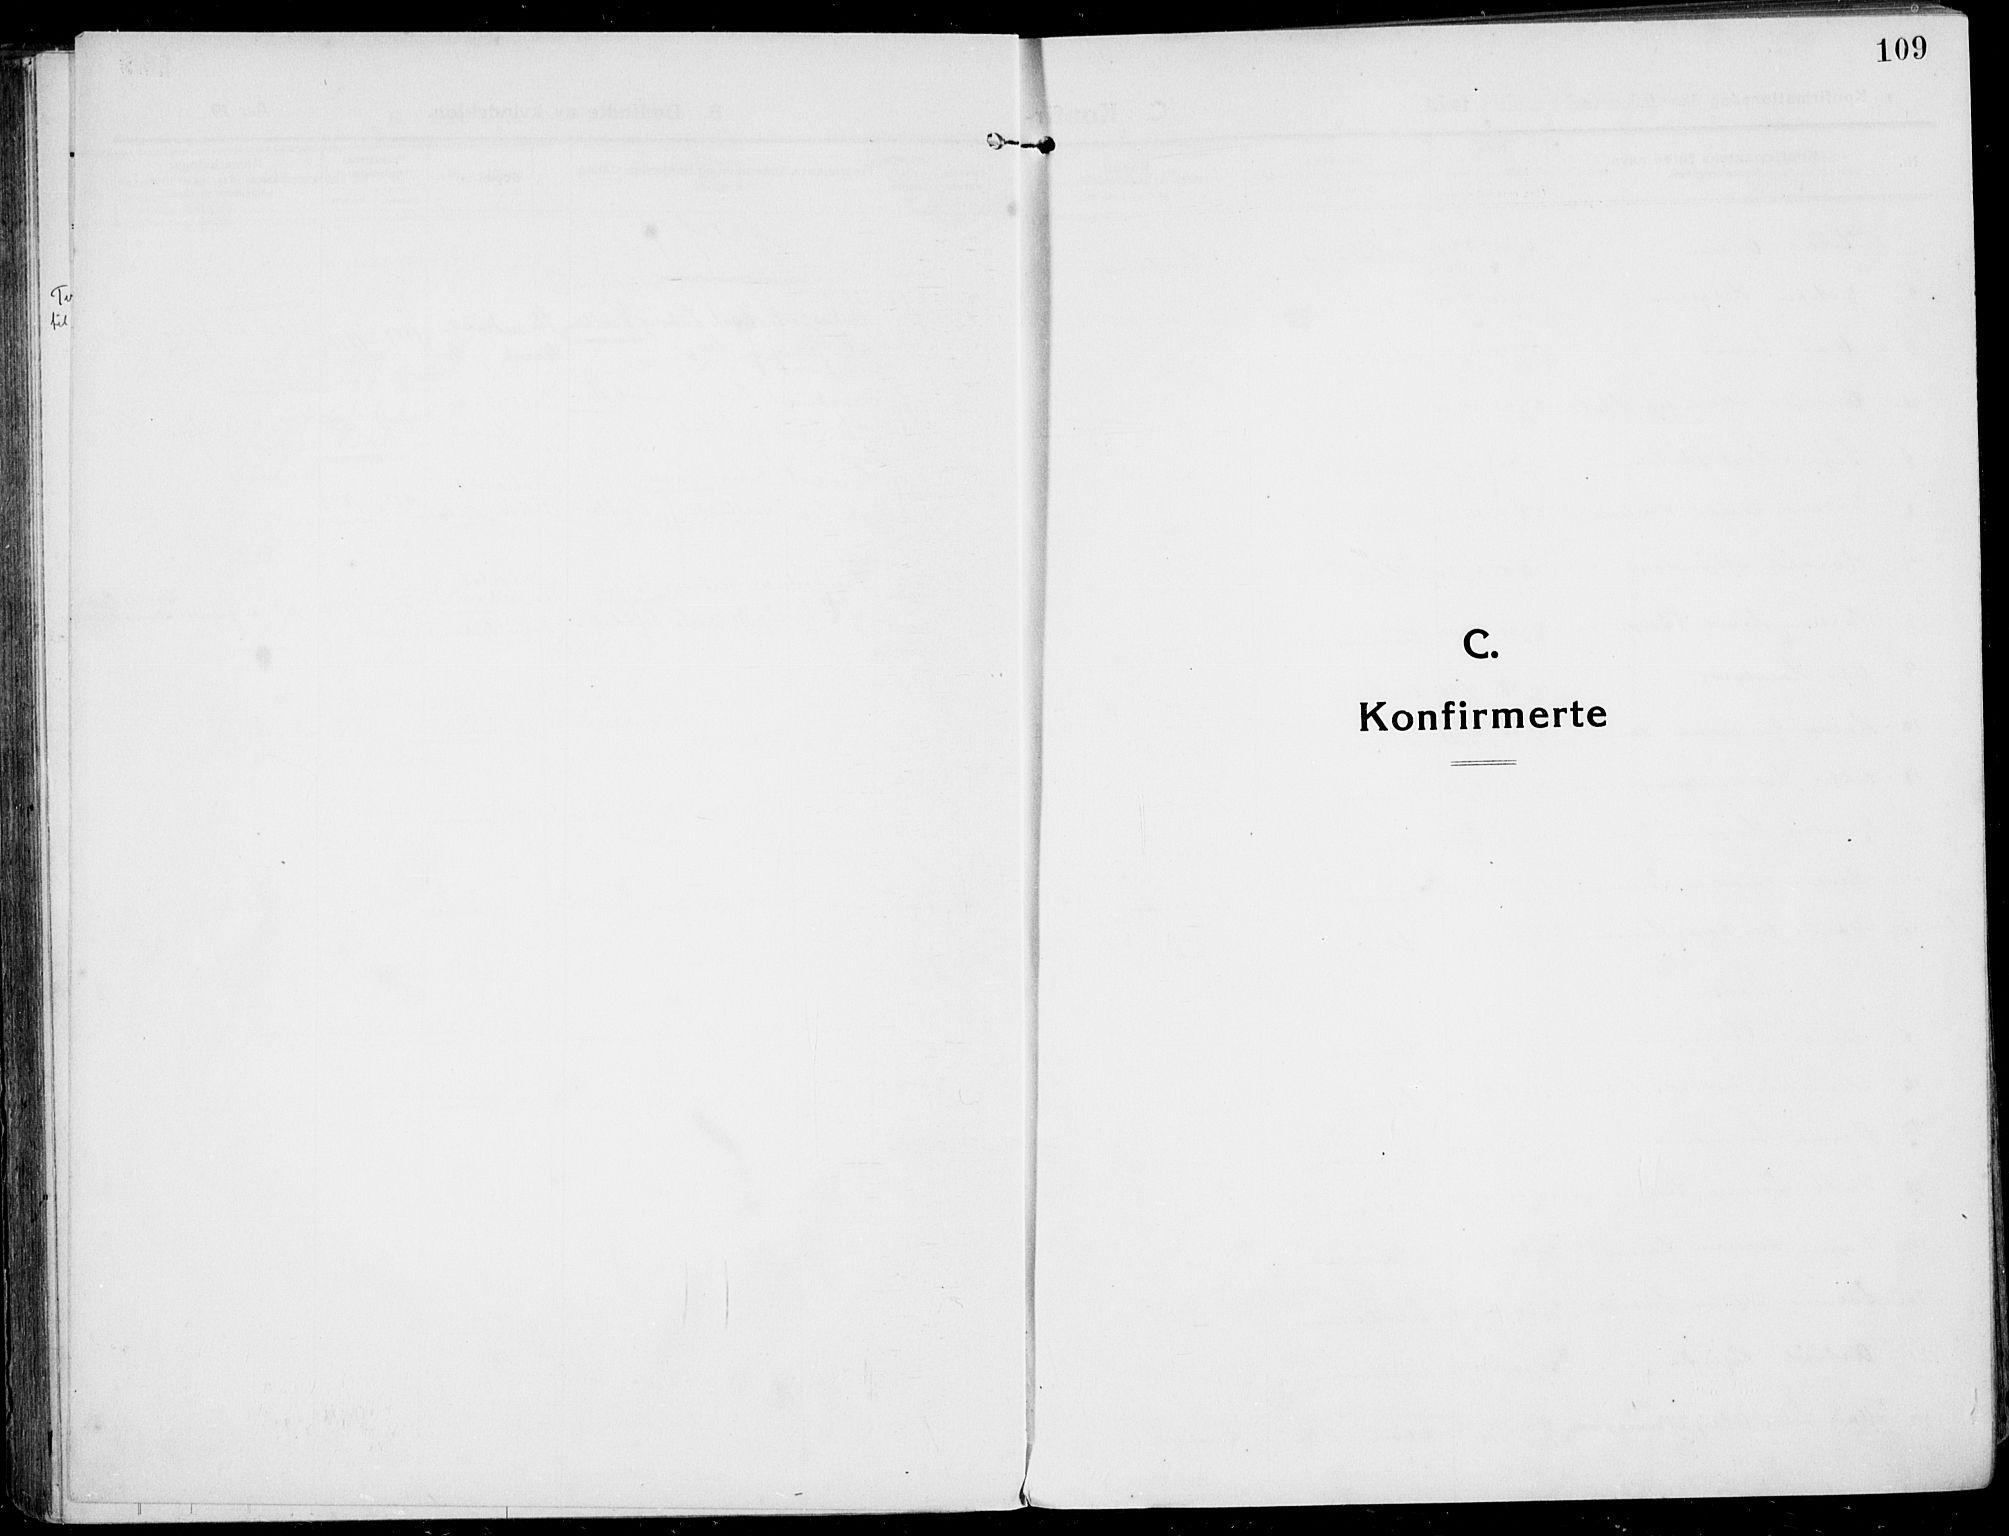 SAKO, Rjukan kirkebøker, F/Fa/L0002: Ministerialbok nr. 2, 1912-1917, s. 109